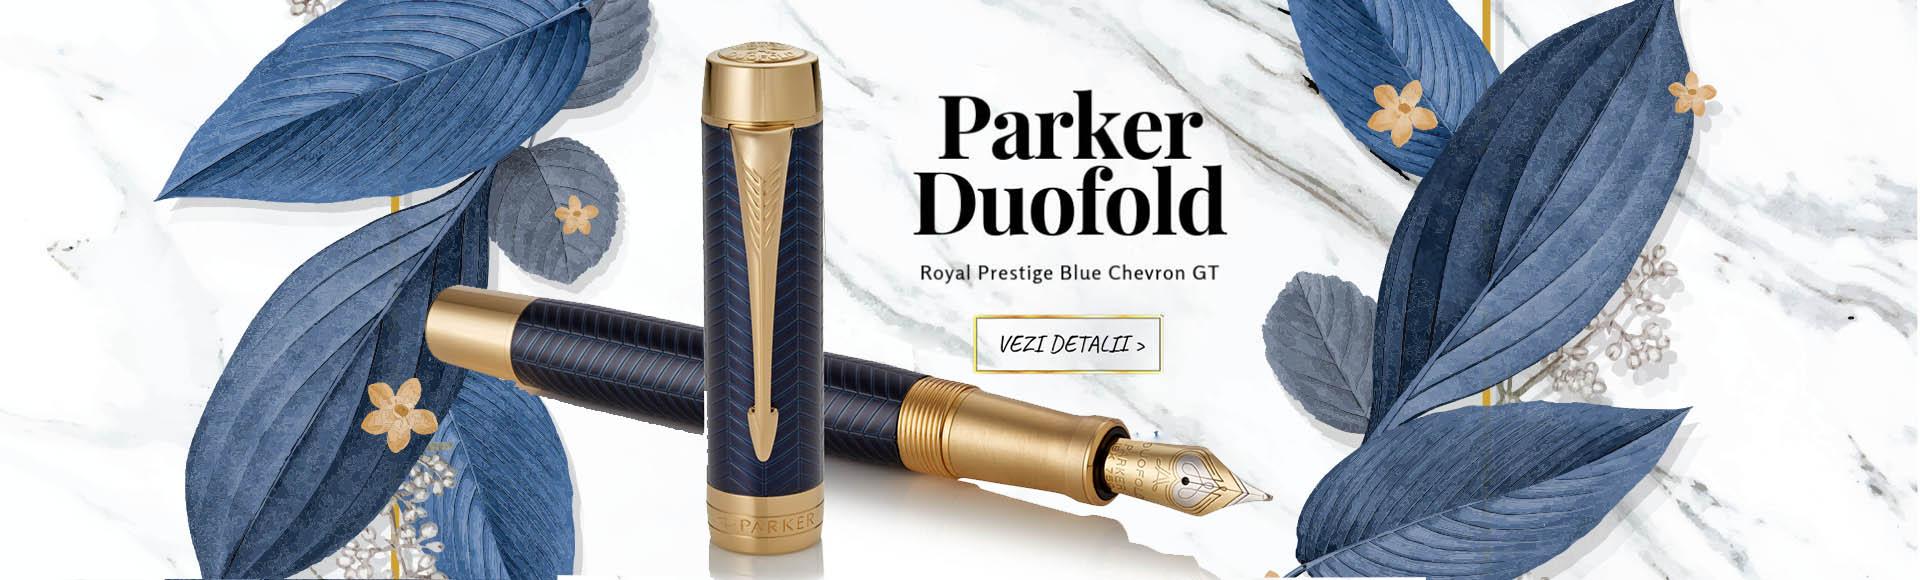 Parker Duofold Prestige Blue Chevron